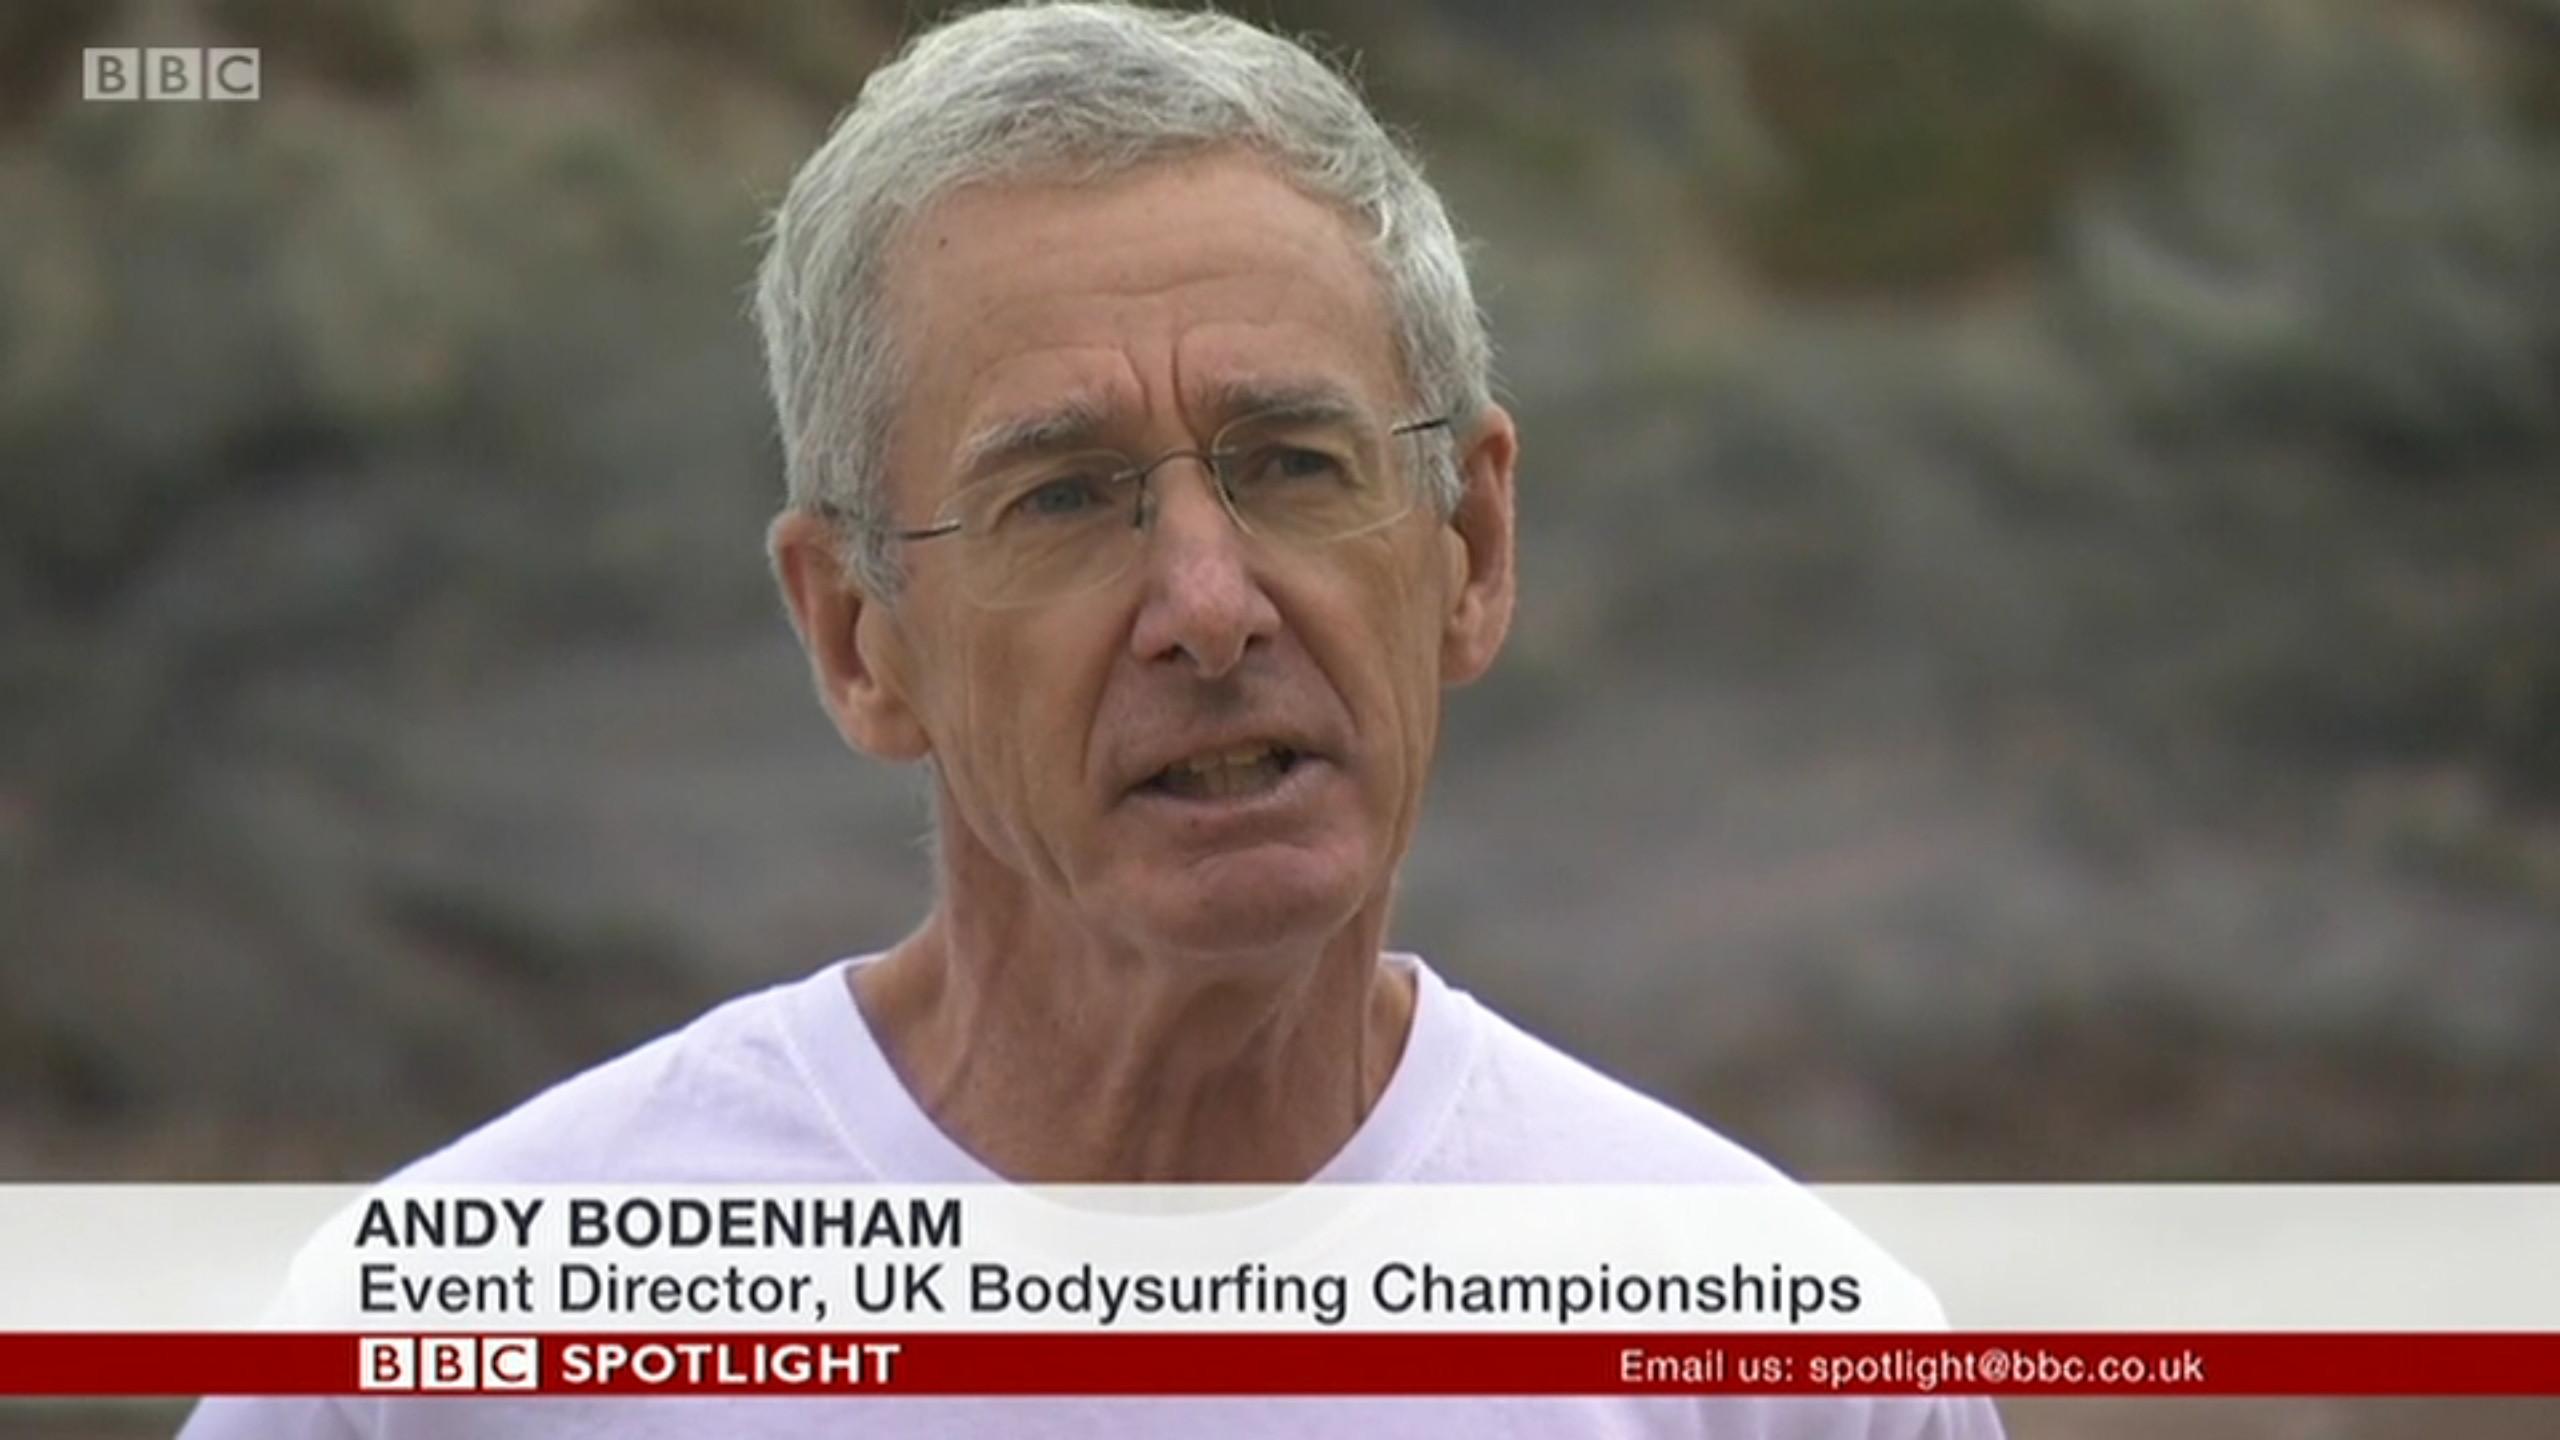 Andy Bodenham